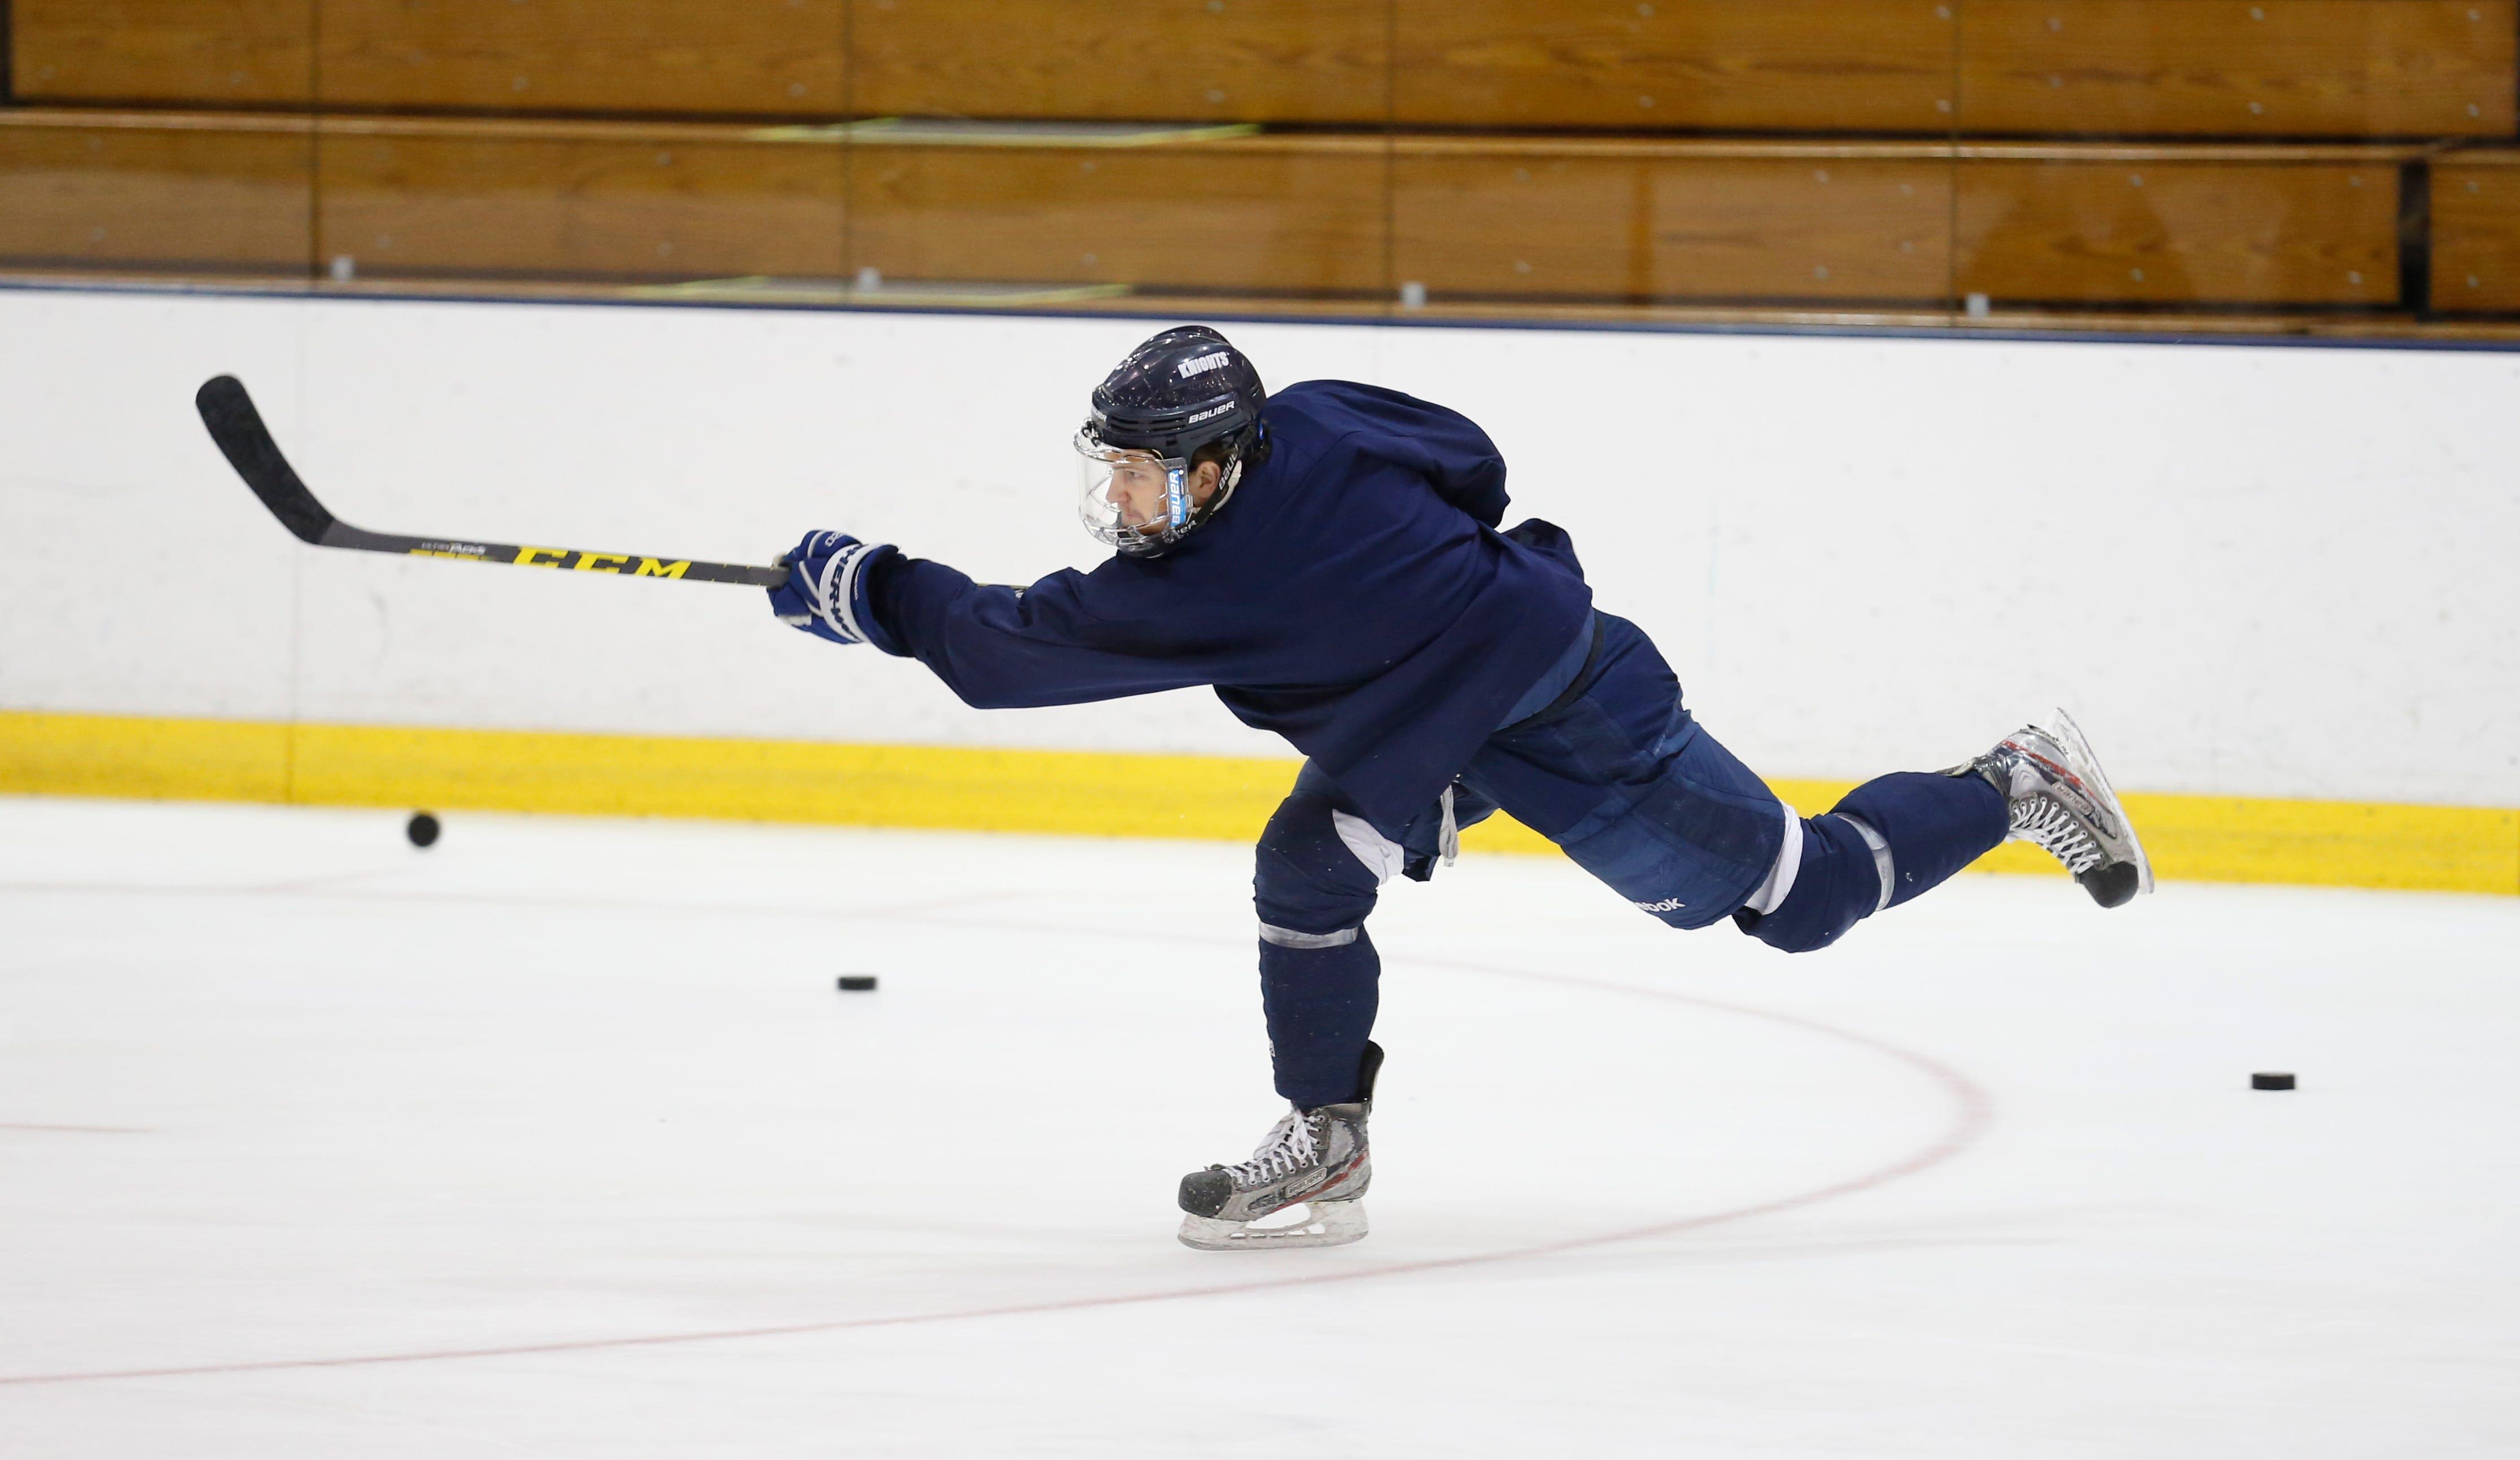 Geneseo Hockey Injury Statistics - image 5